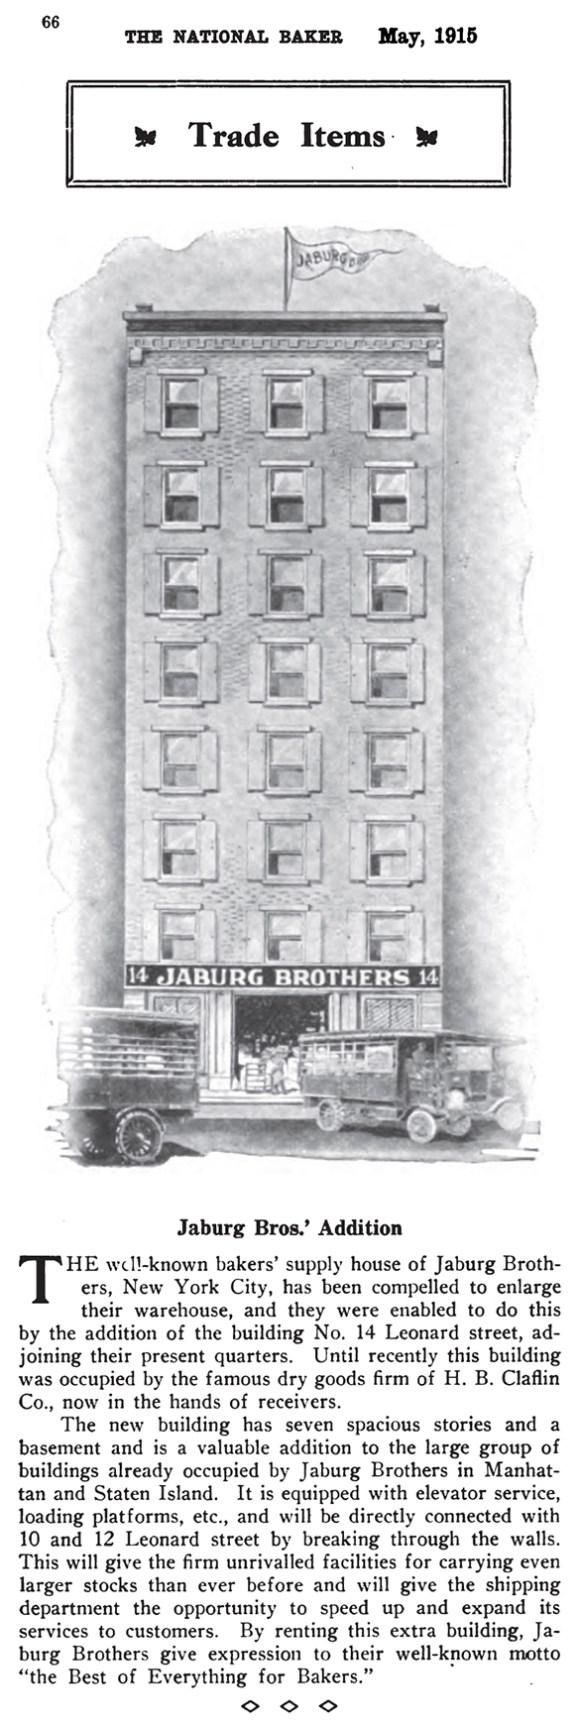 jaburg bros 1912 u2013 bakery supplies u2013 stapleton waterfront si